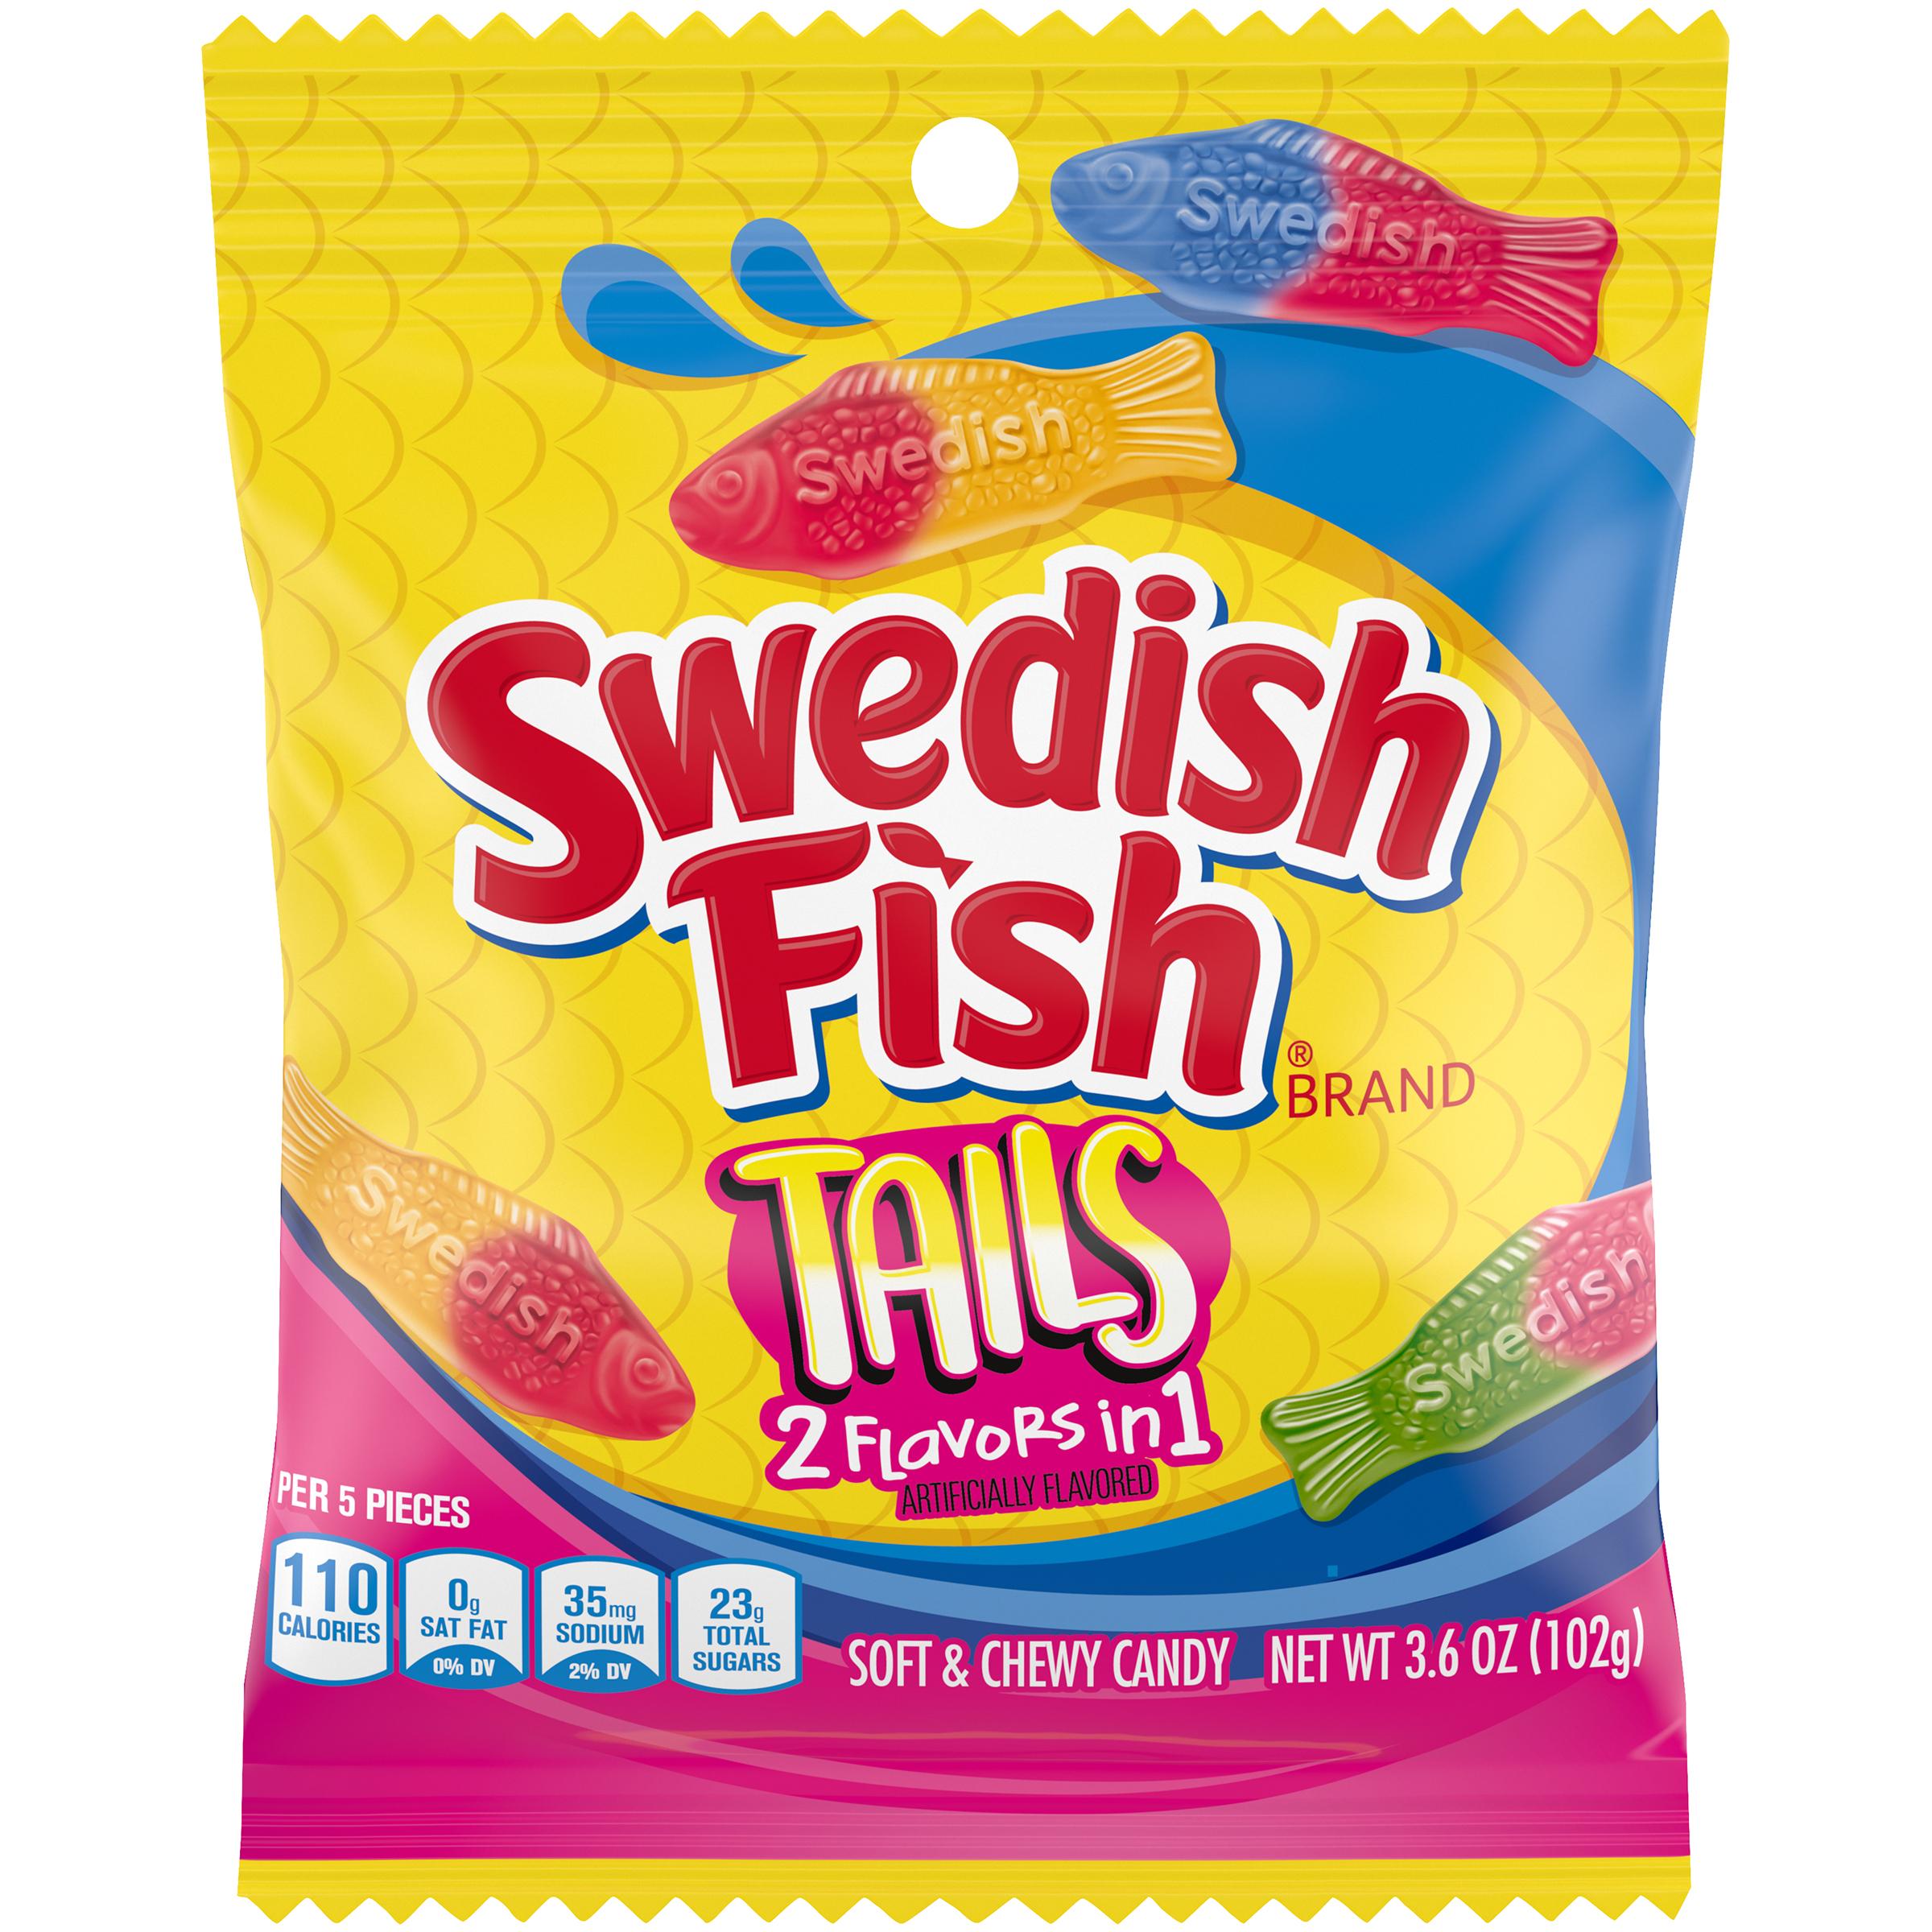 SWEDISH FISH Tails Tails Soft Candy 3.6 oz